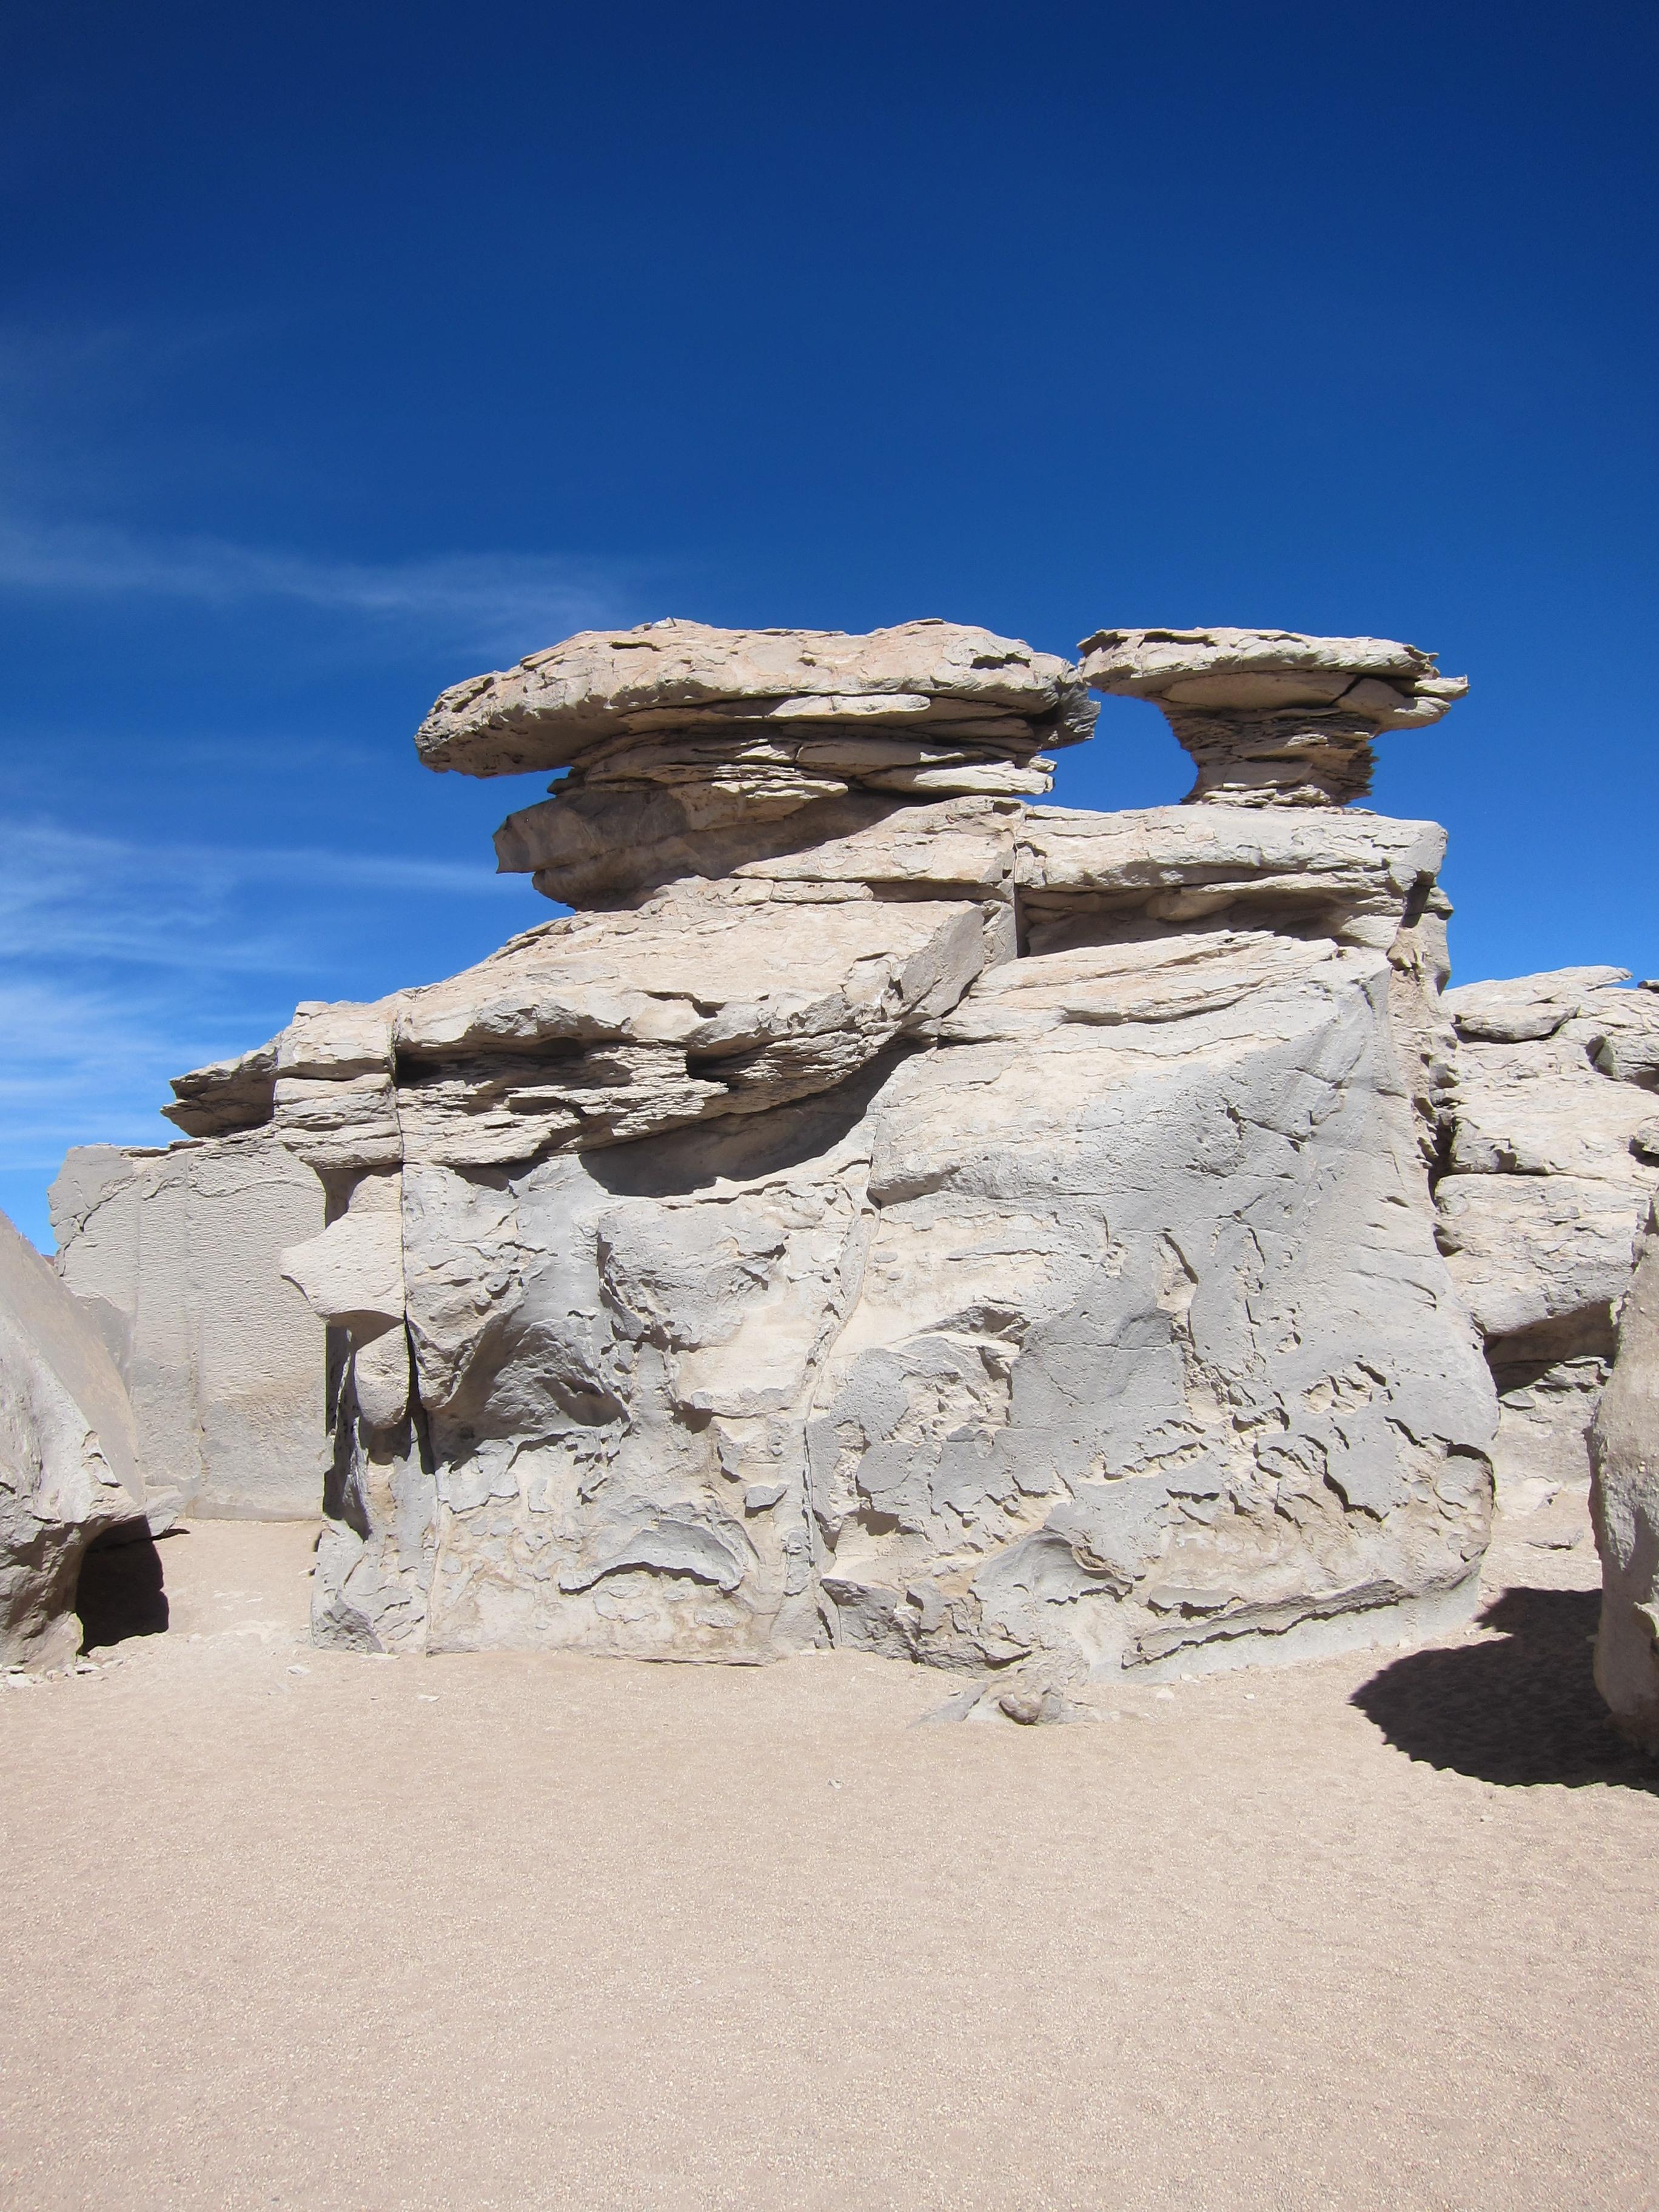 Desierto del Siloli with the Arbol de Piedra